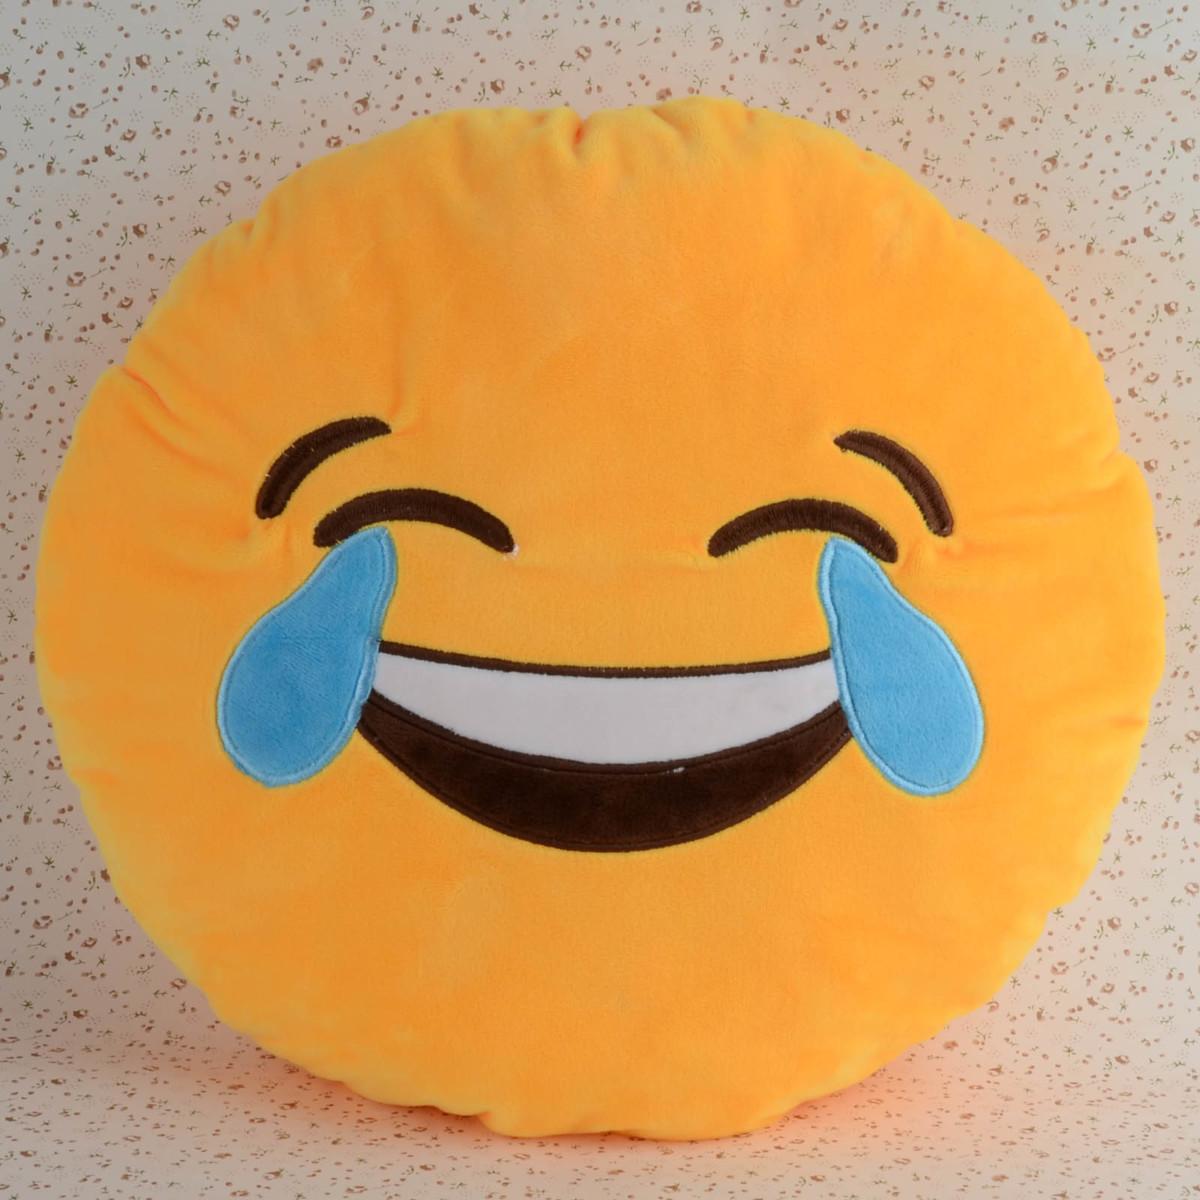 Coussin rond doux oreiller jaune Emoji émoticônes Smiley peluche